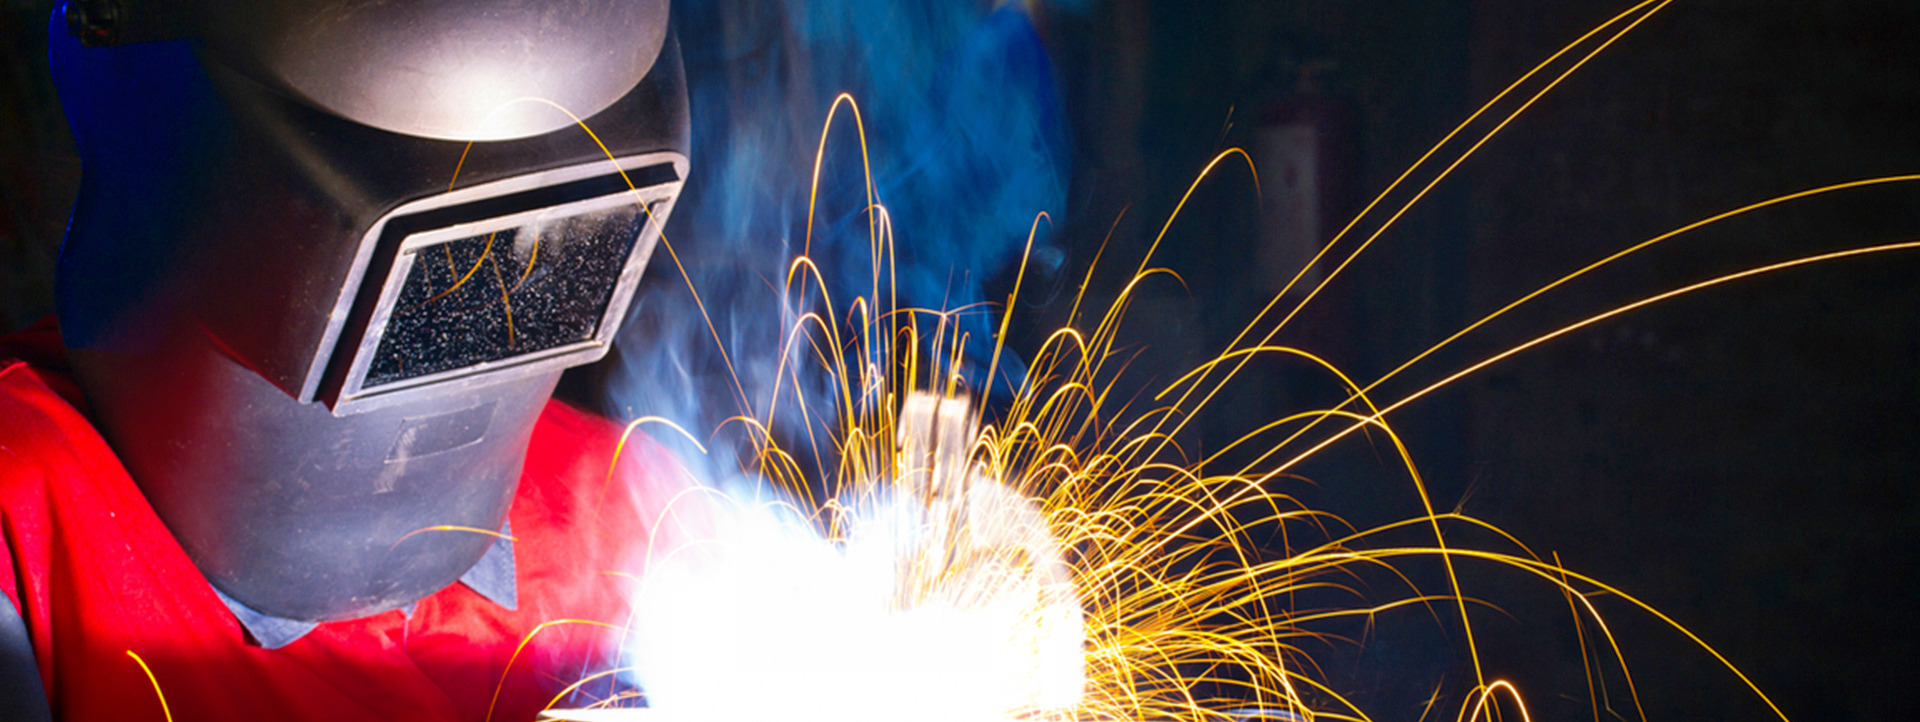 modern welding processes essay